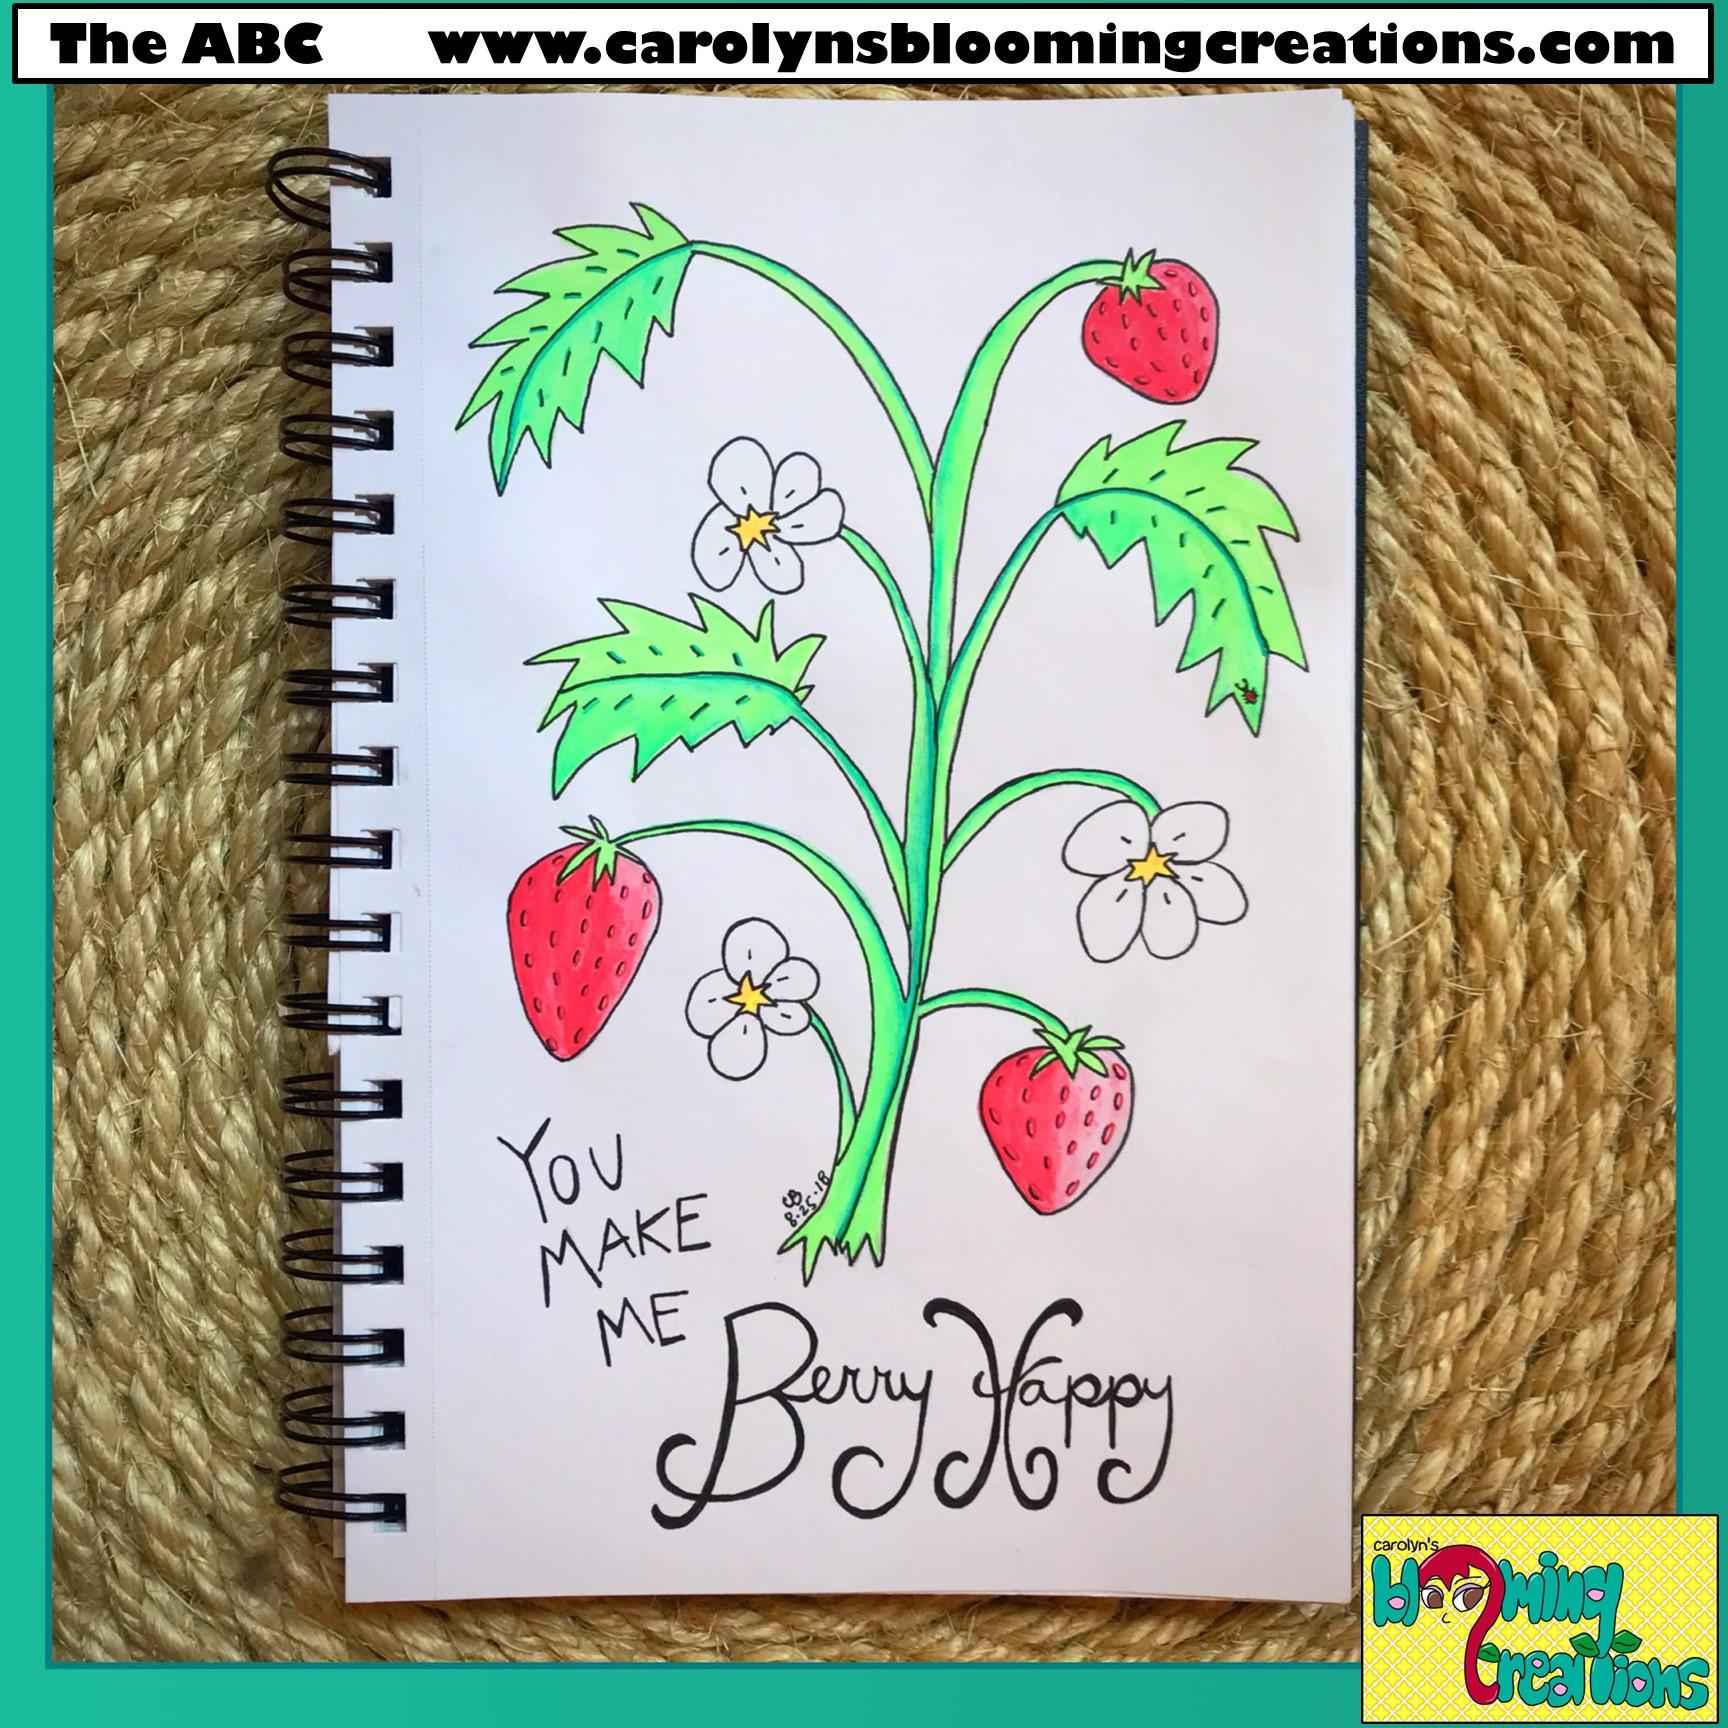 Pin Me! www.carolynsbloomingcreations.com  Art by Carolyn J. Braden, Media: Gelly Roll pens and BIC pencil.